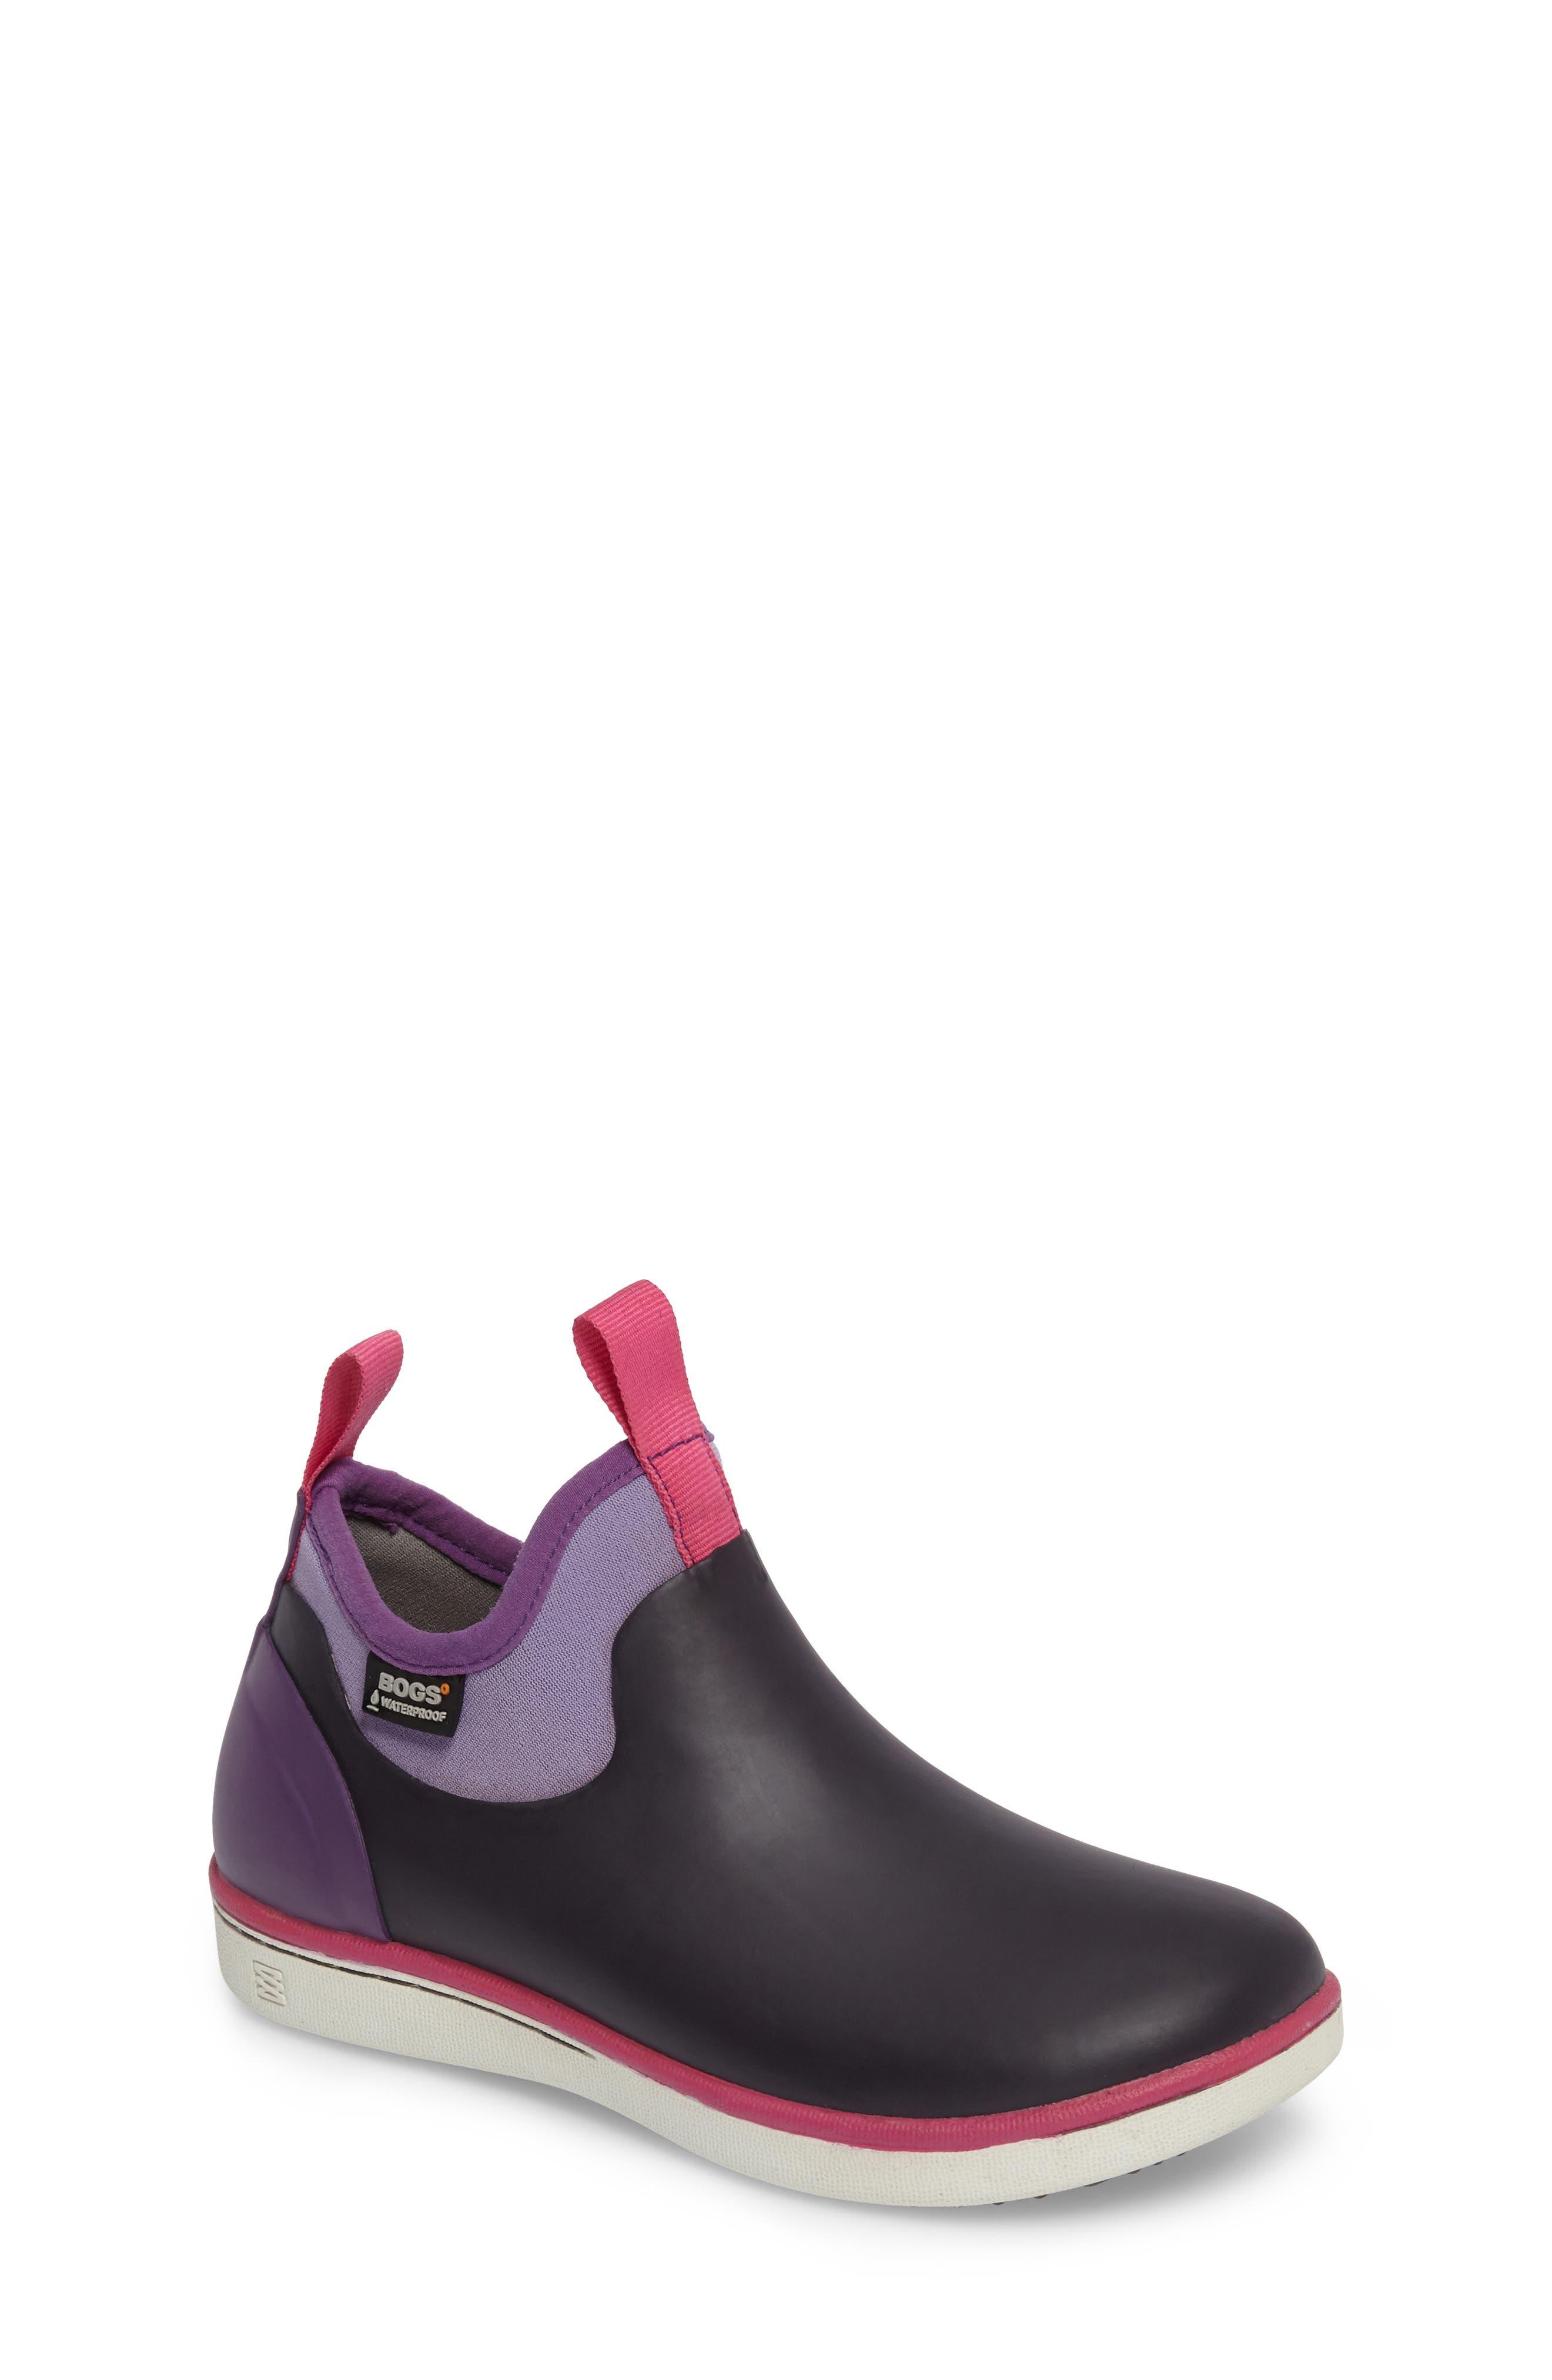 Main Image - Bogs Riley Waterproof Sock Fit Boot (Walker, Toddler & Little Kid)